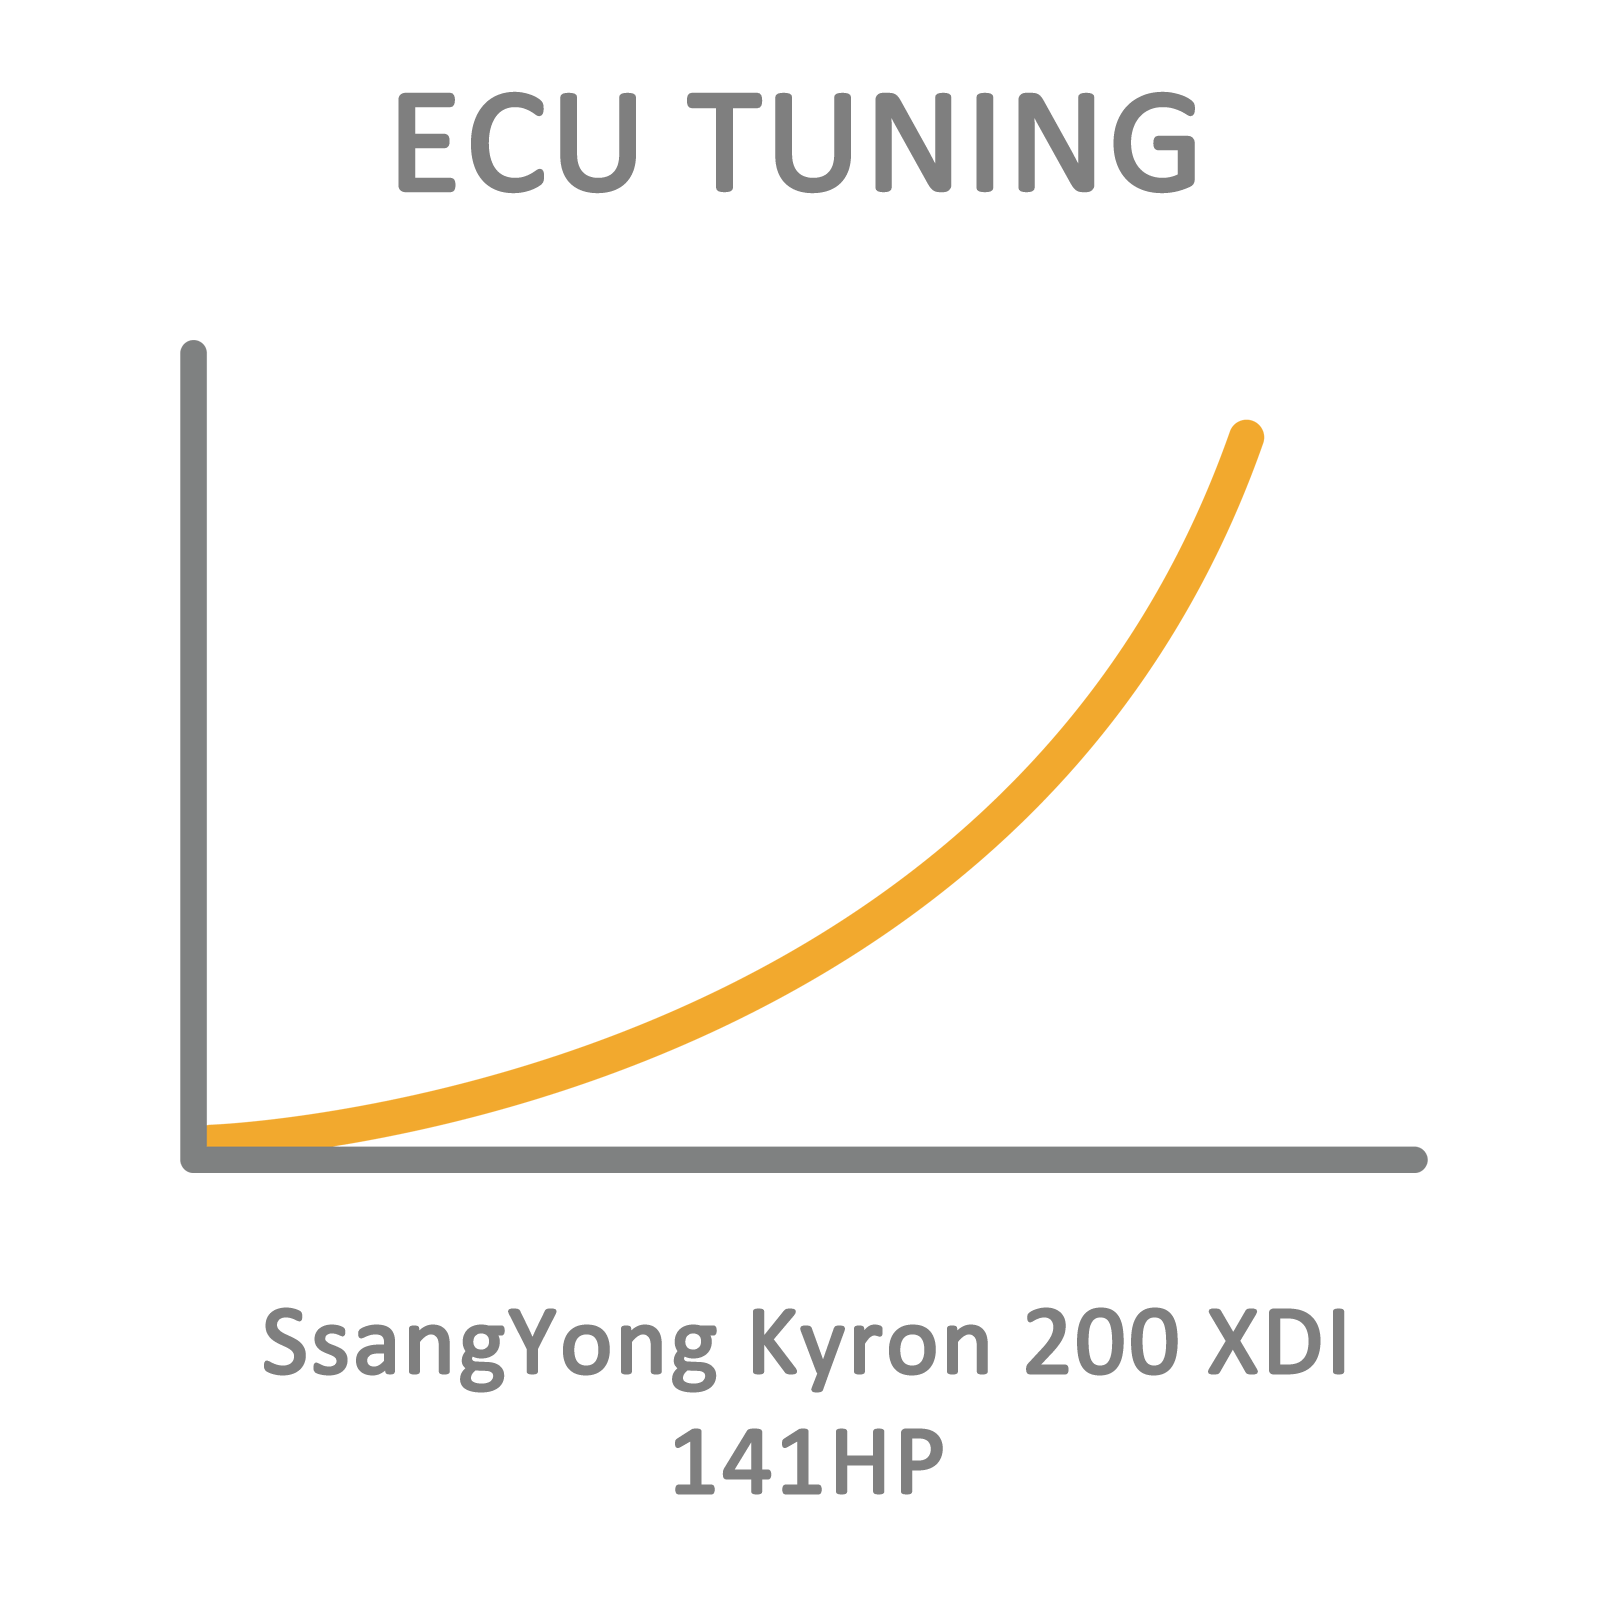 SsangYong Kyron 200 XDI 141HP ECU Tuning Remapping Programming